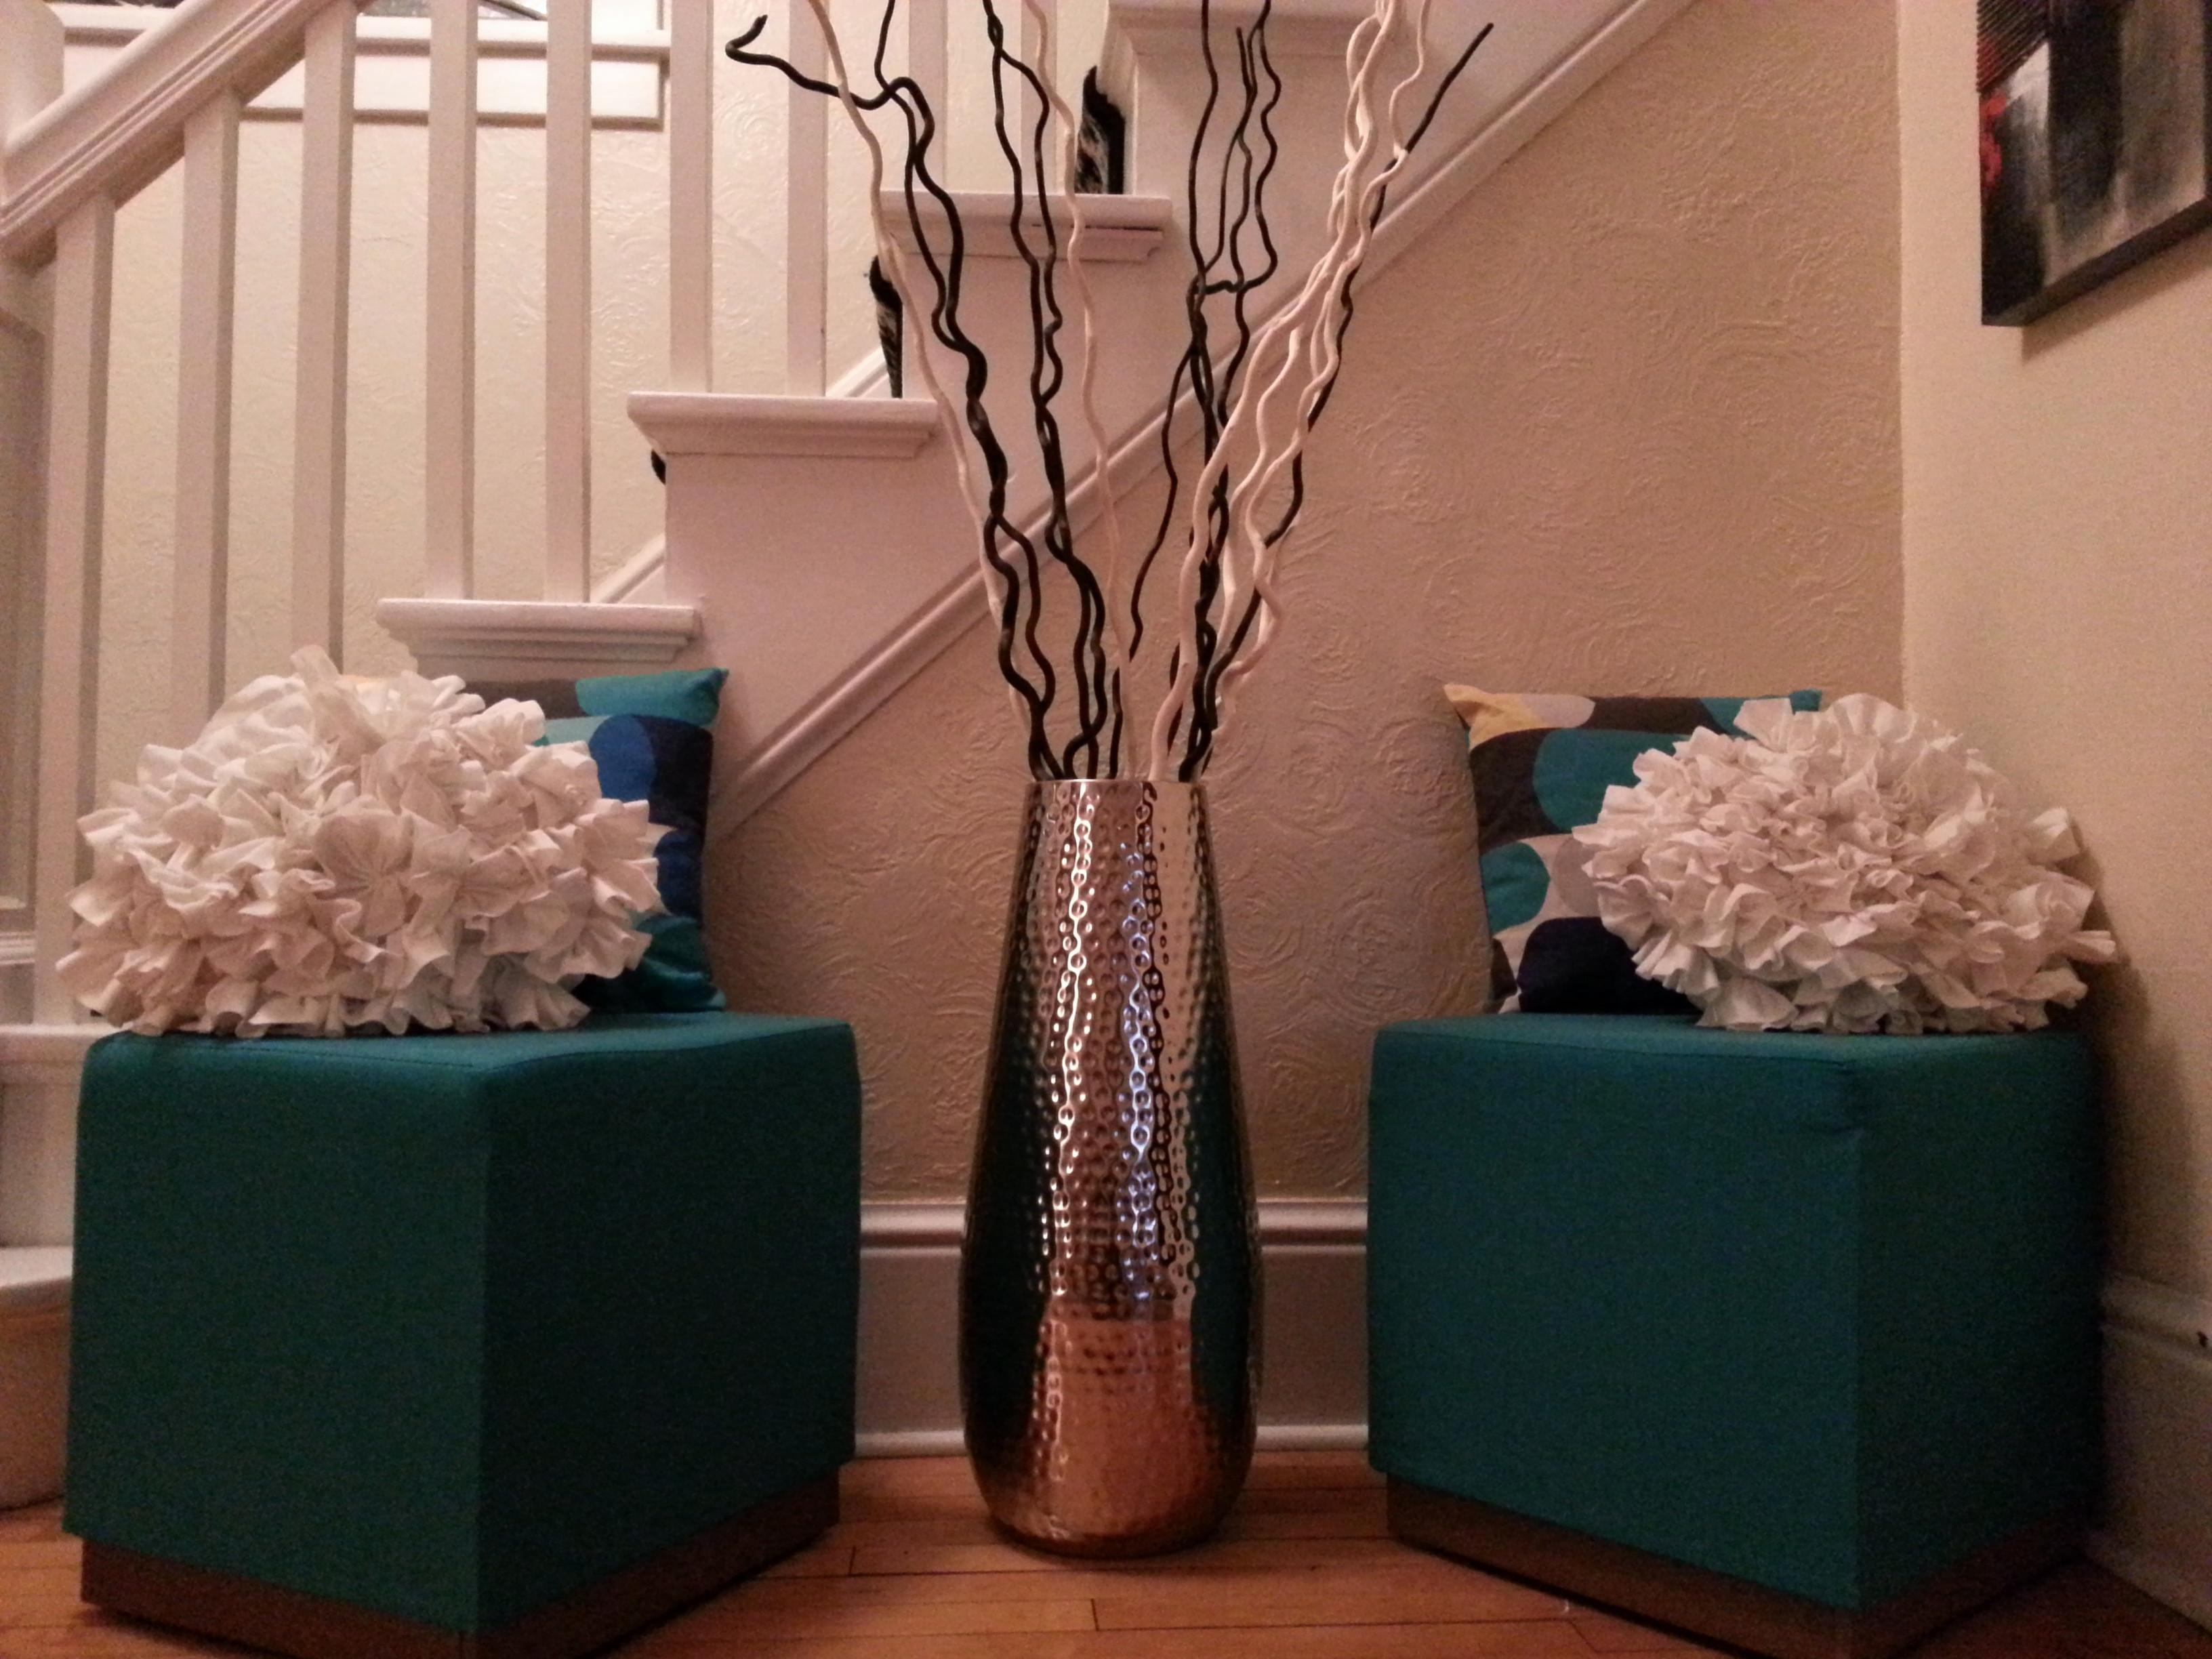 Wholesale Floor Vases Of Decorative Vases for Living Room Elegant 45 Inspirational Ideas for Inside Decorative Vases for Living Room Elegant 45 Inspirational Ideas for Living Room Decor Graph